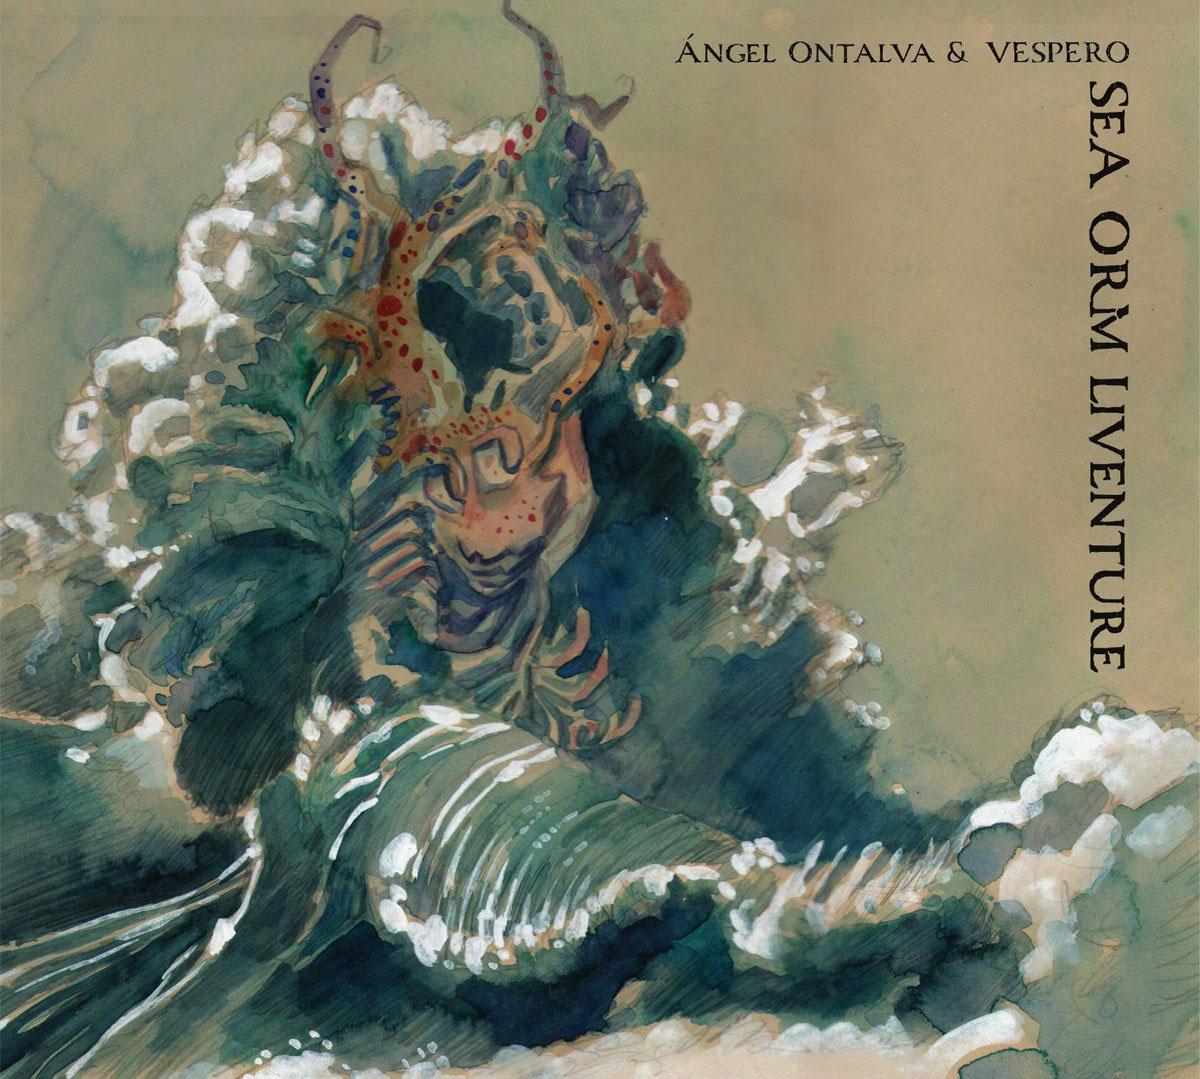 ÁNGEL ONTALVA - Ángel Ontalva & Vespero: Sea Orm Liventure cover